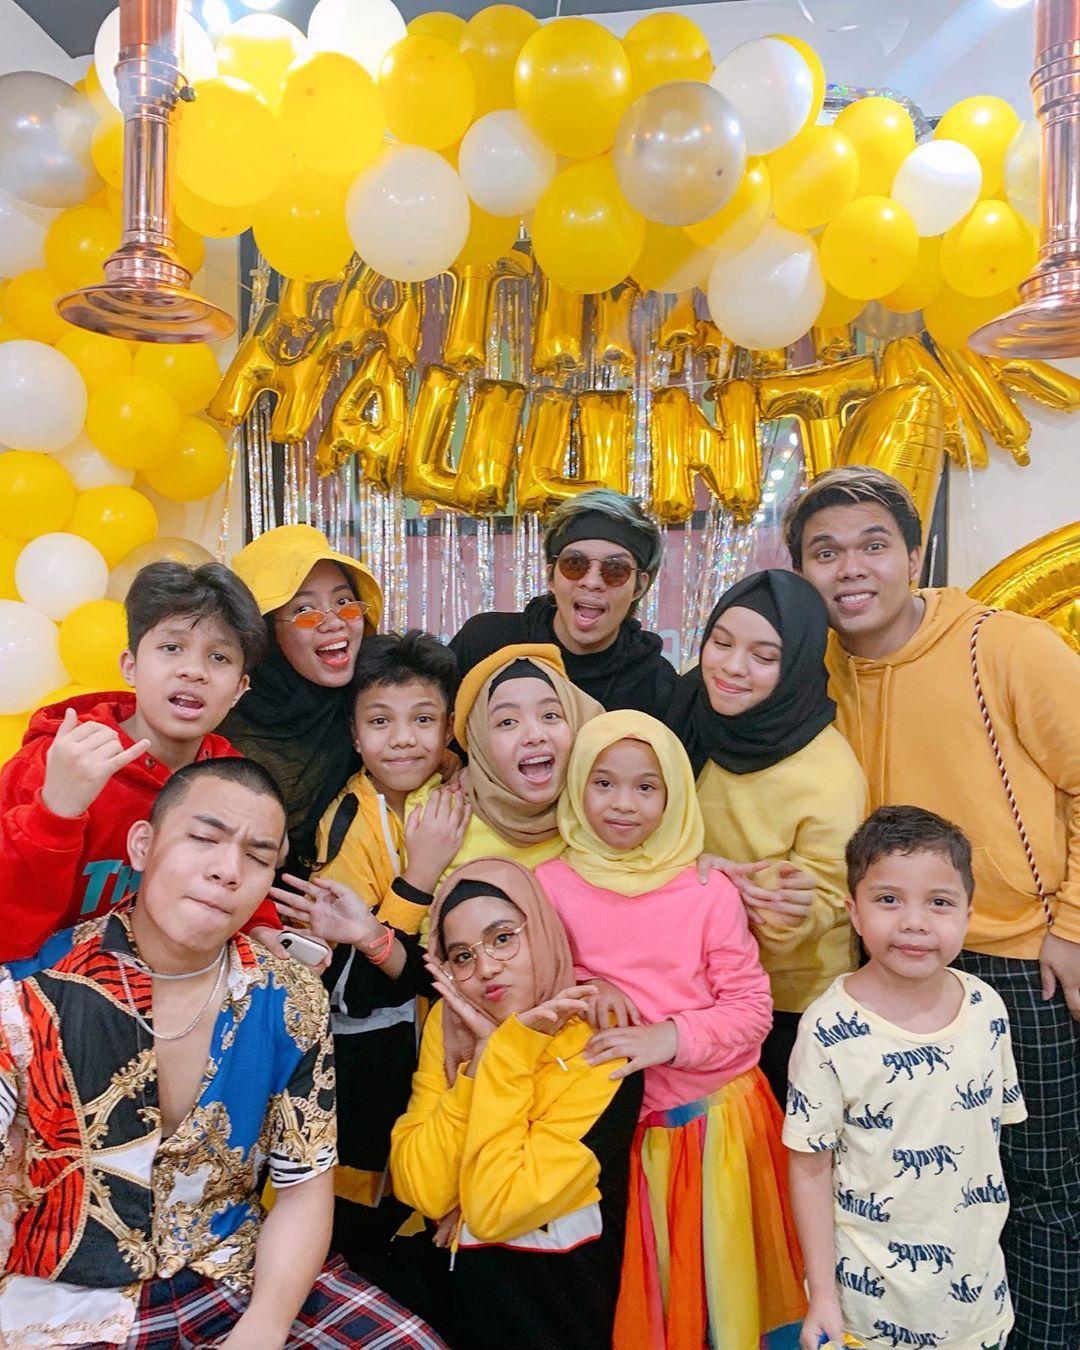 Siti Fatimah Halilintar Di Instagram Thankyou For This Beautiful Yellowy Bright Night Everything Is Just Foto Keluarga Artis Kecil Fotografi